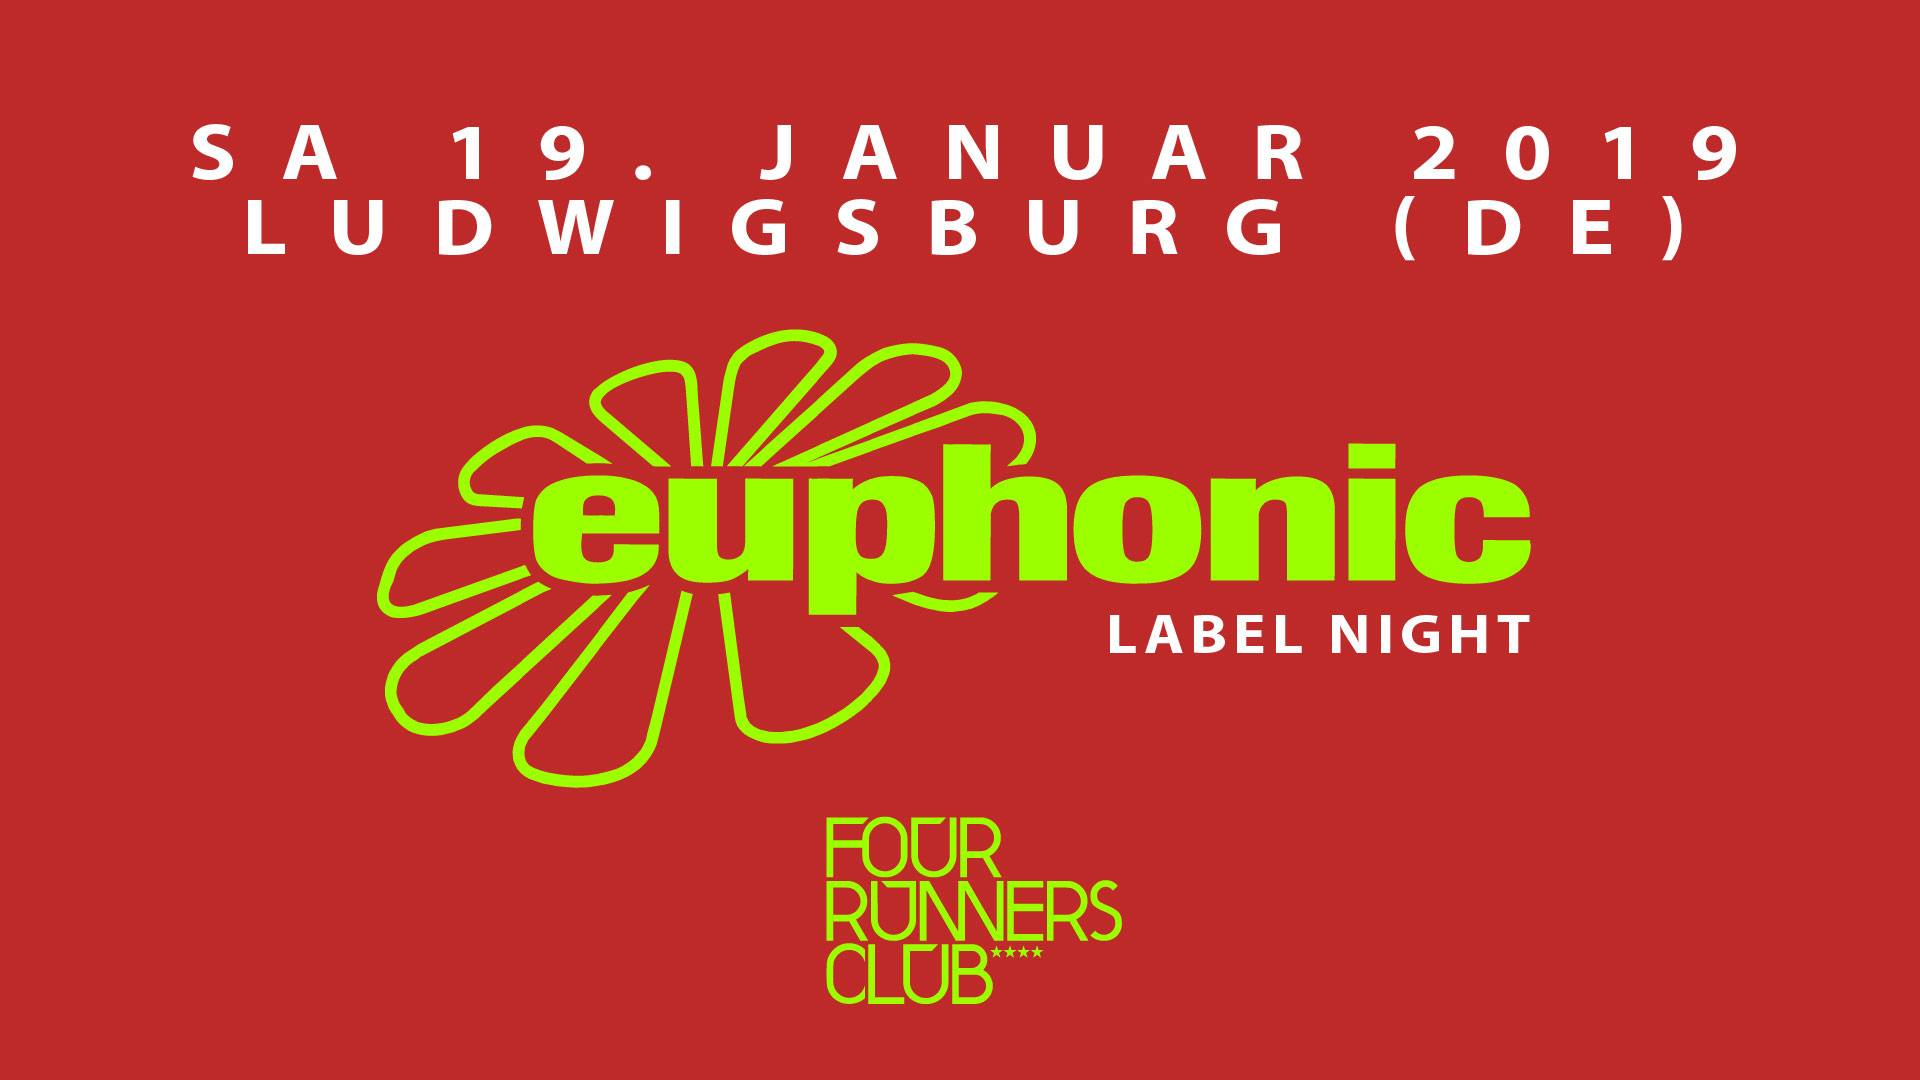 19.01.2019 Euphonic Label Night, Ludwigsburg (DE)